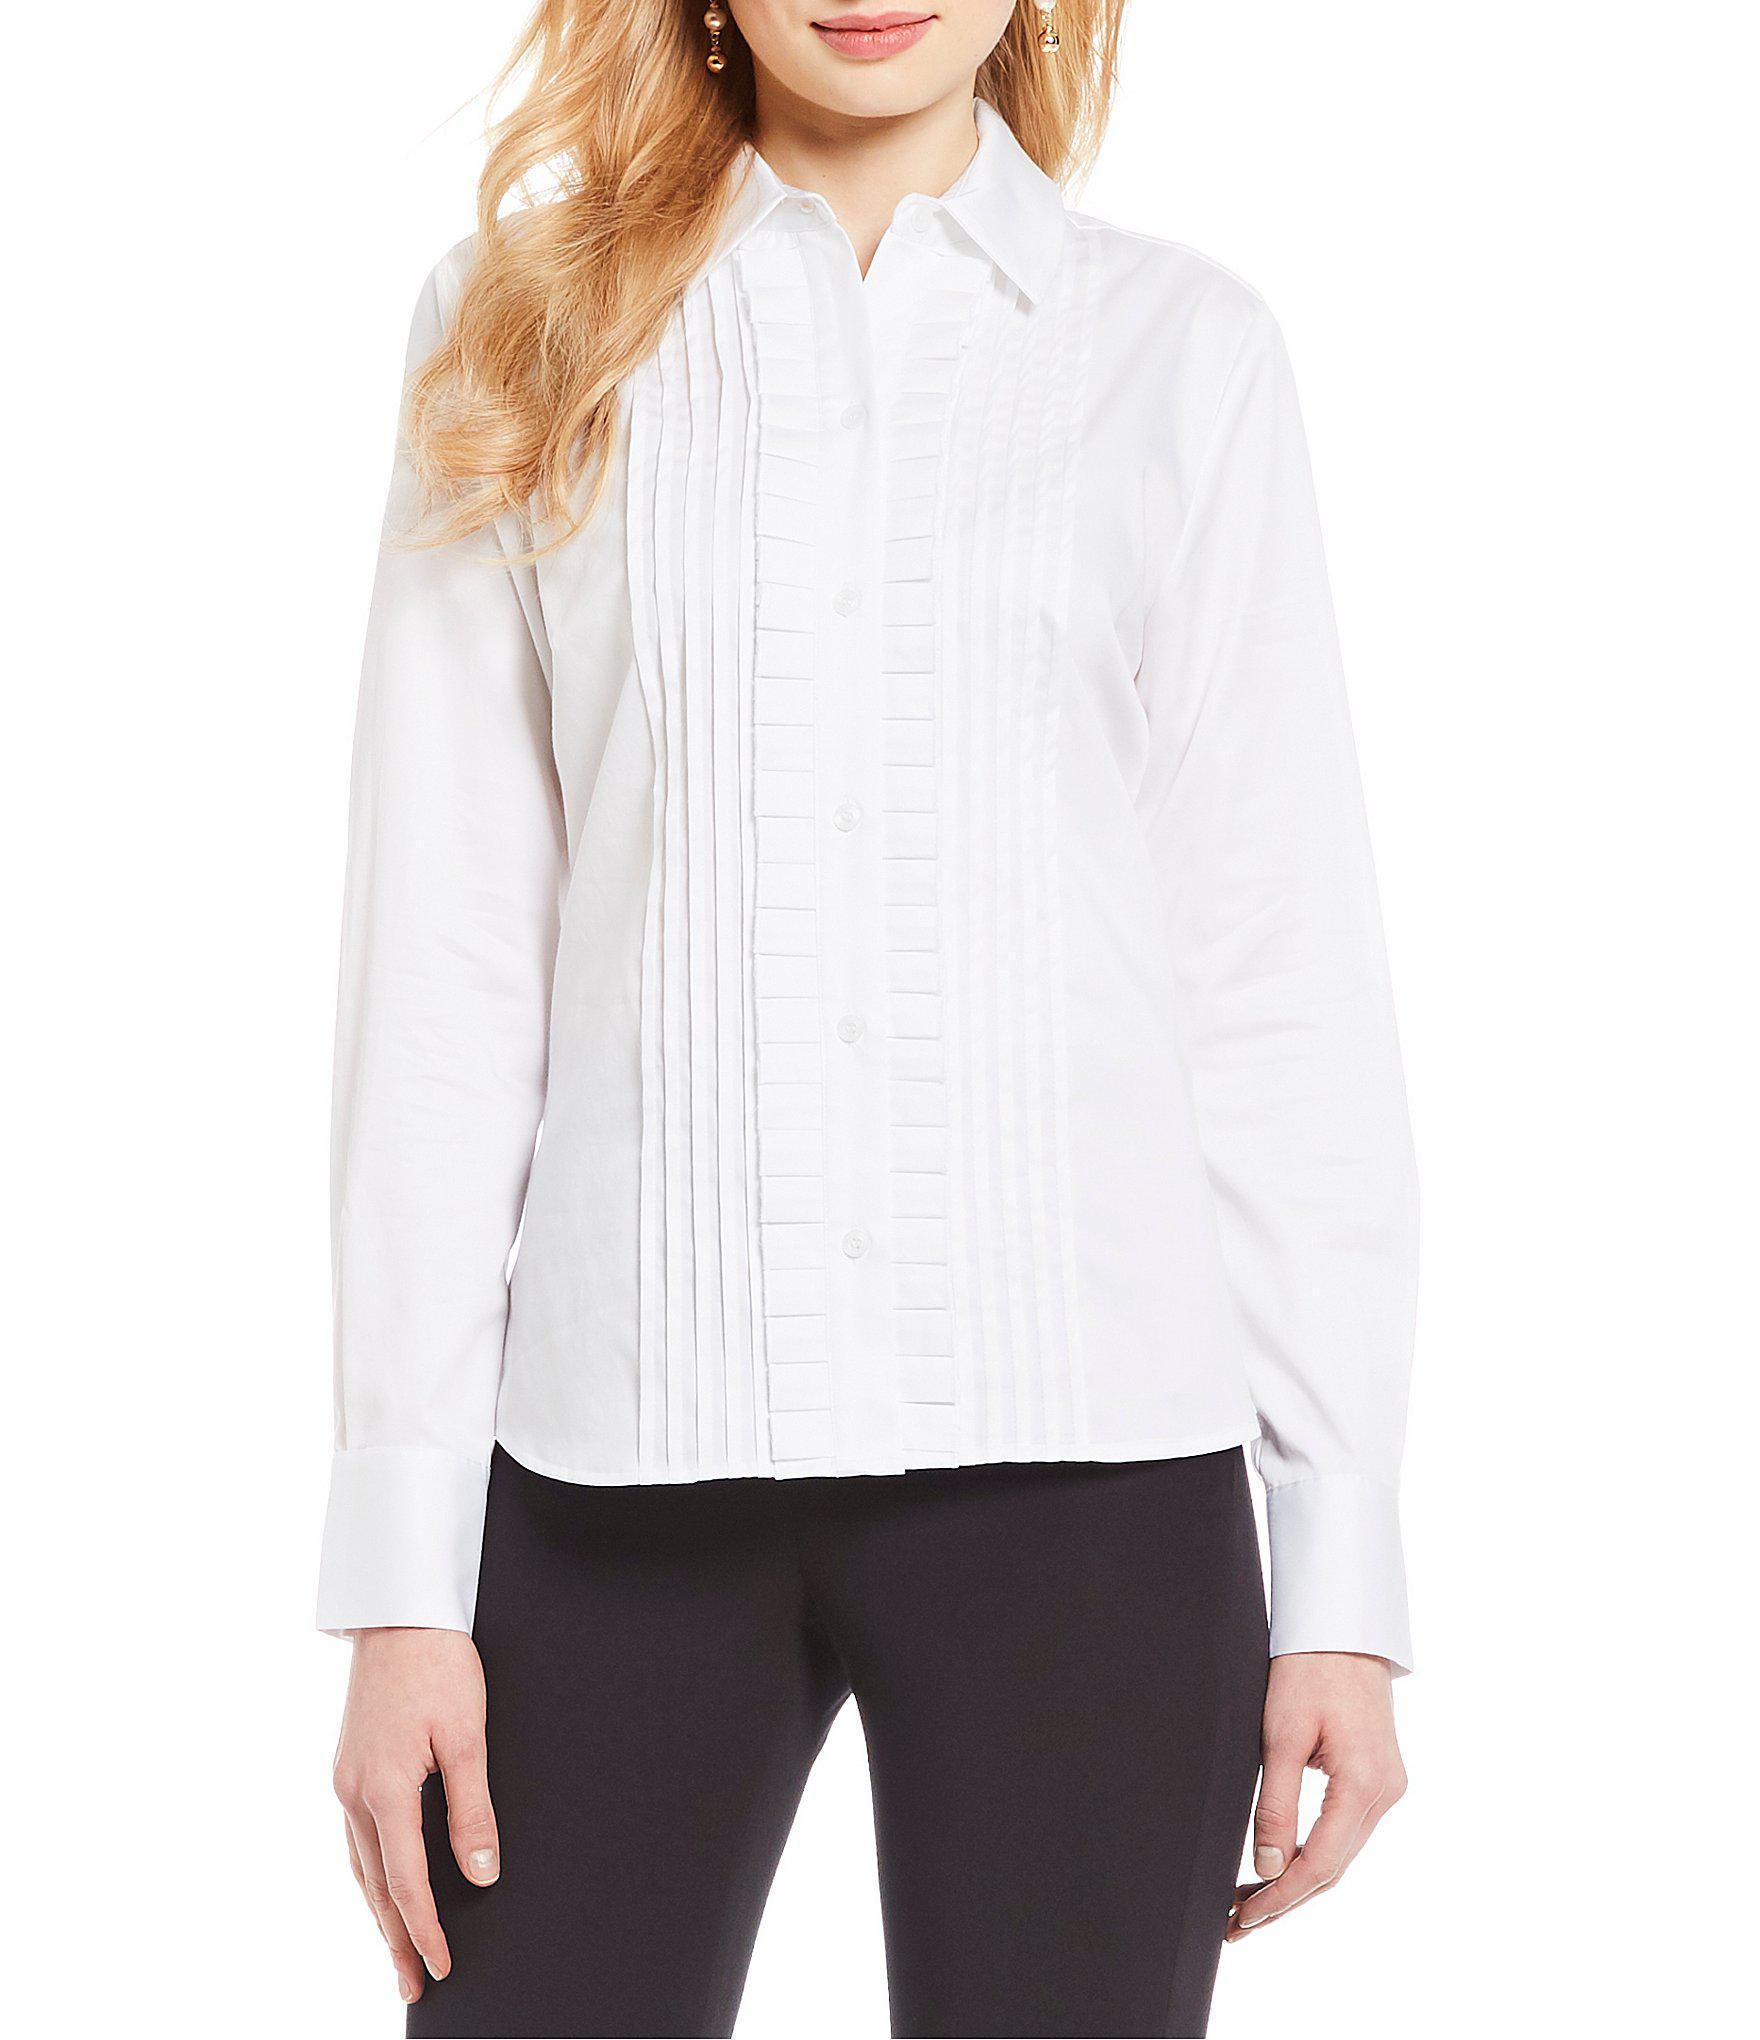 a1c686d2f5f2f9 Lyst - Antonio Melani Nellie Tuxedo Blouse in White